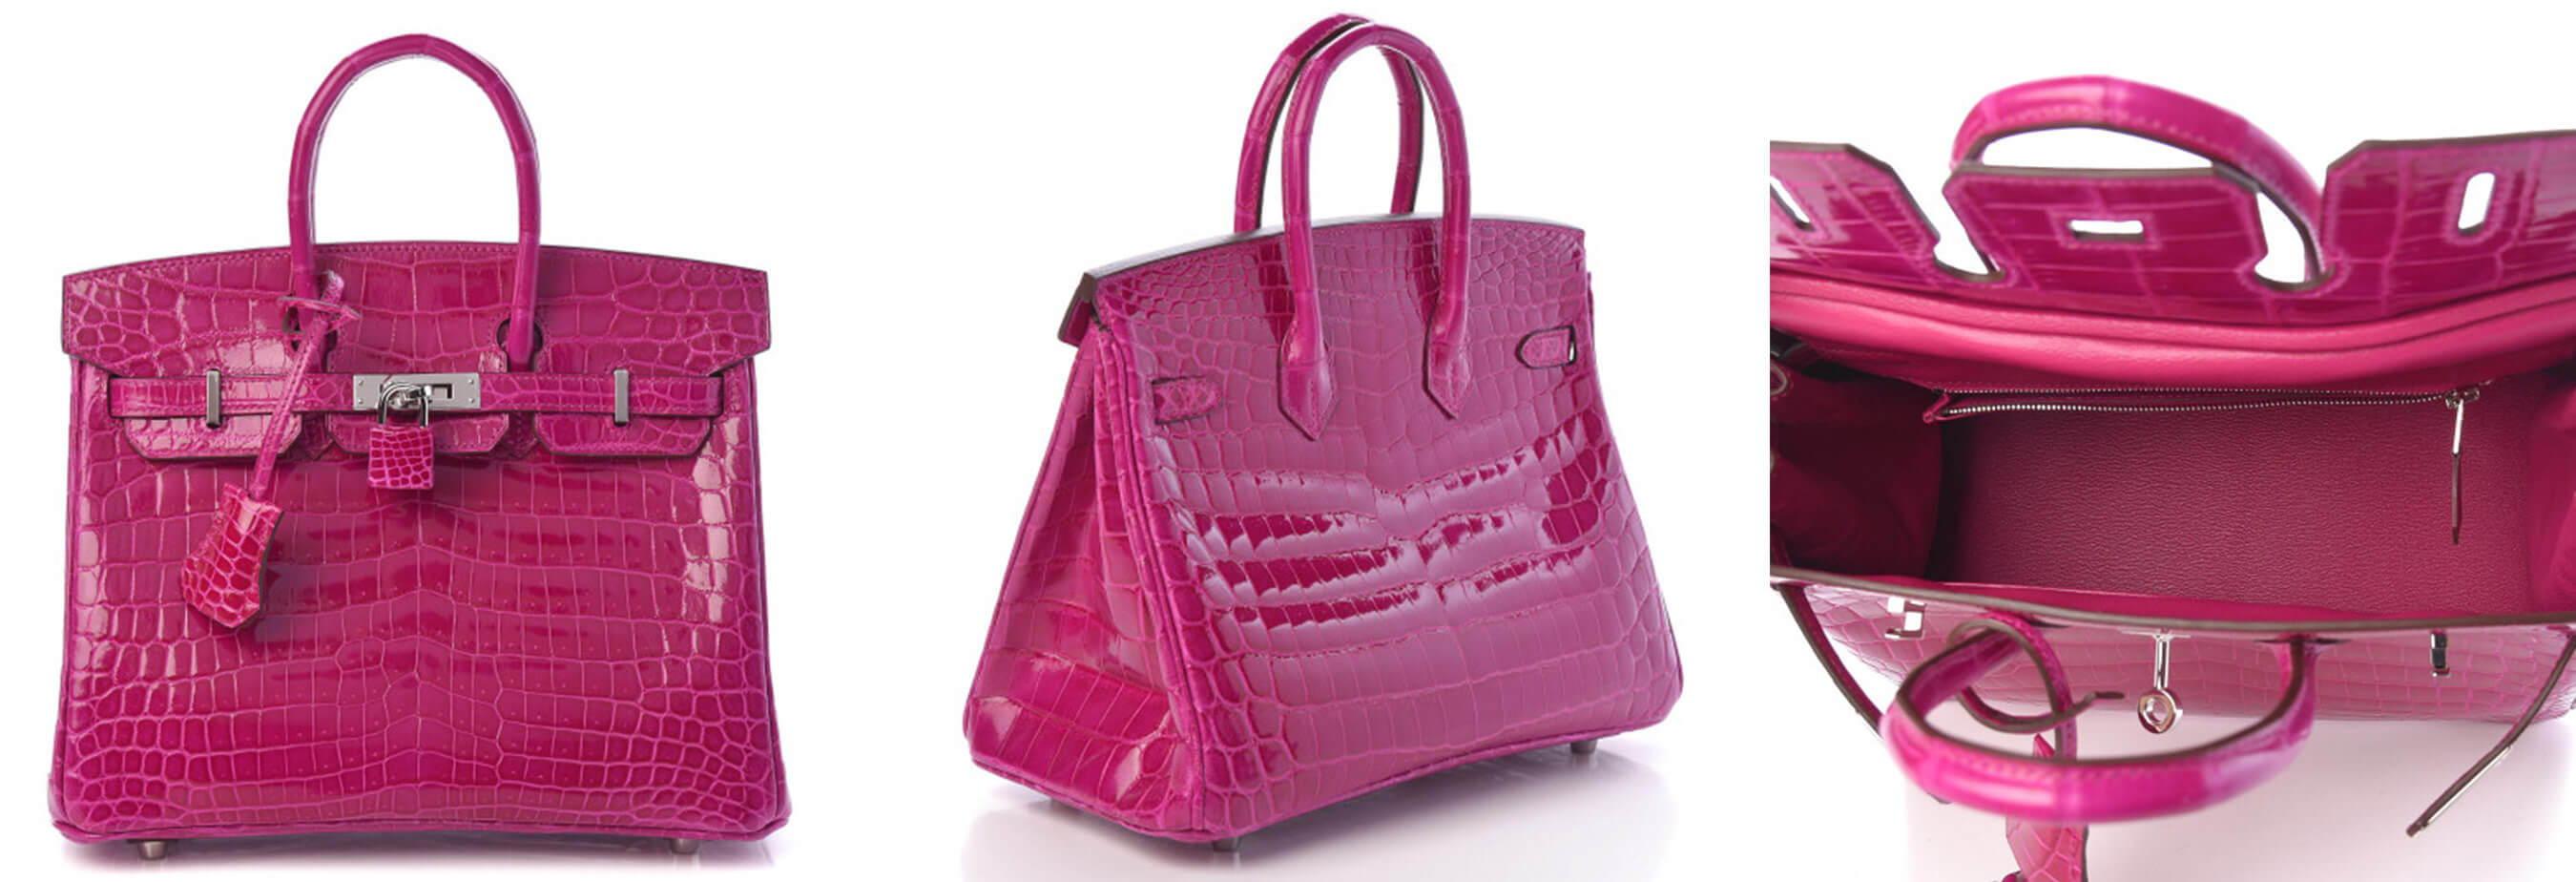 Hermes Shiny Porosus Crocodile Birkin Pink